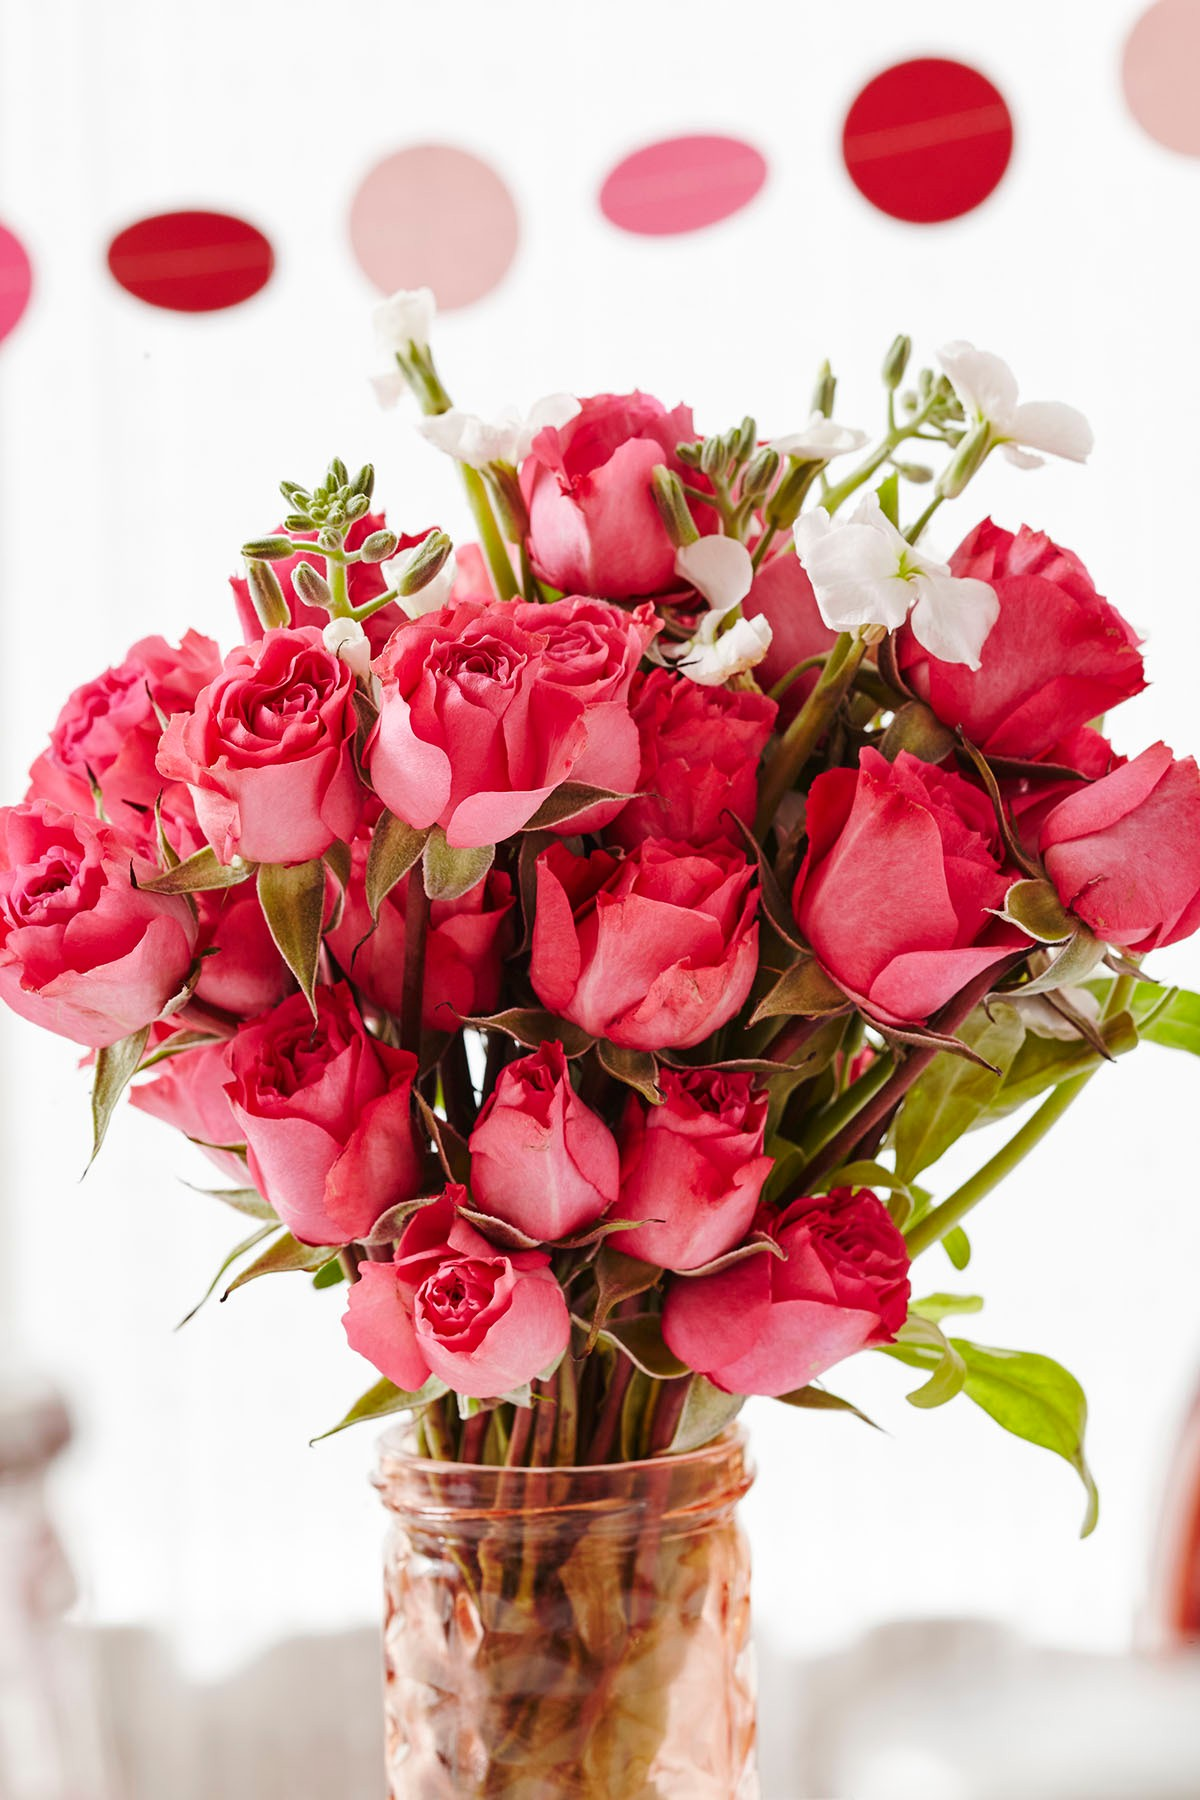 4_0_1valentines_roses_00.jpg